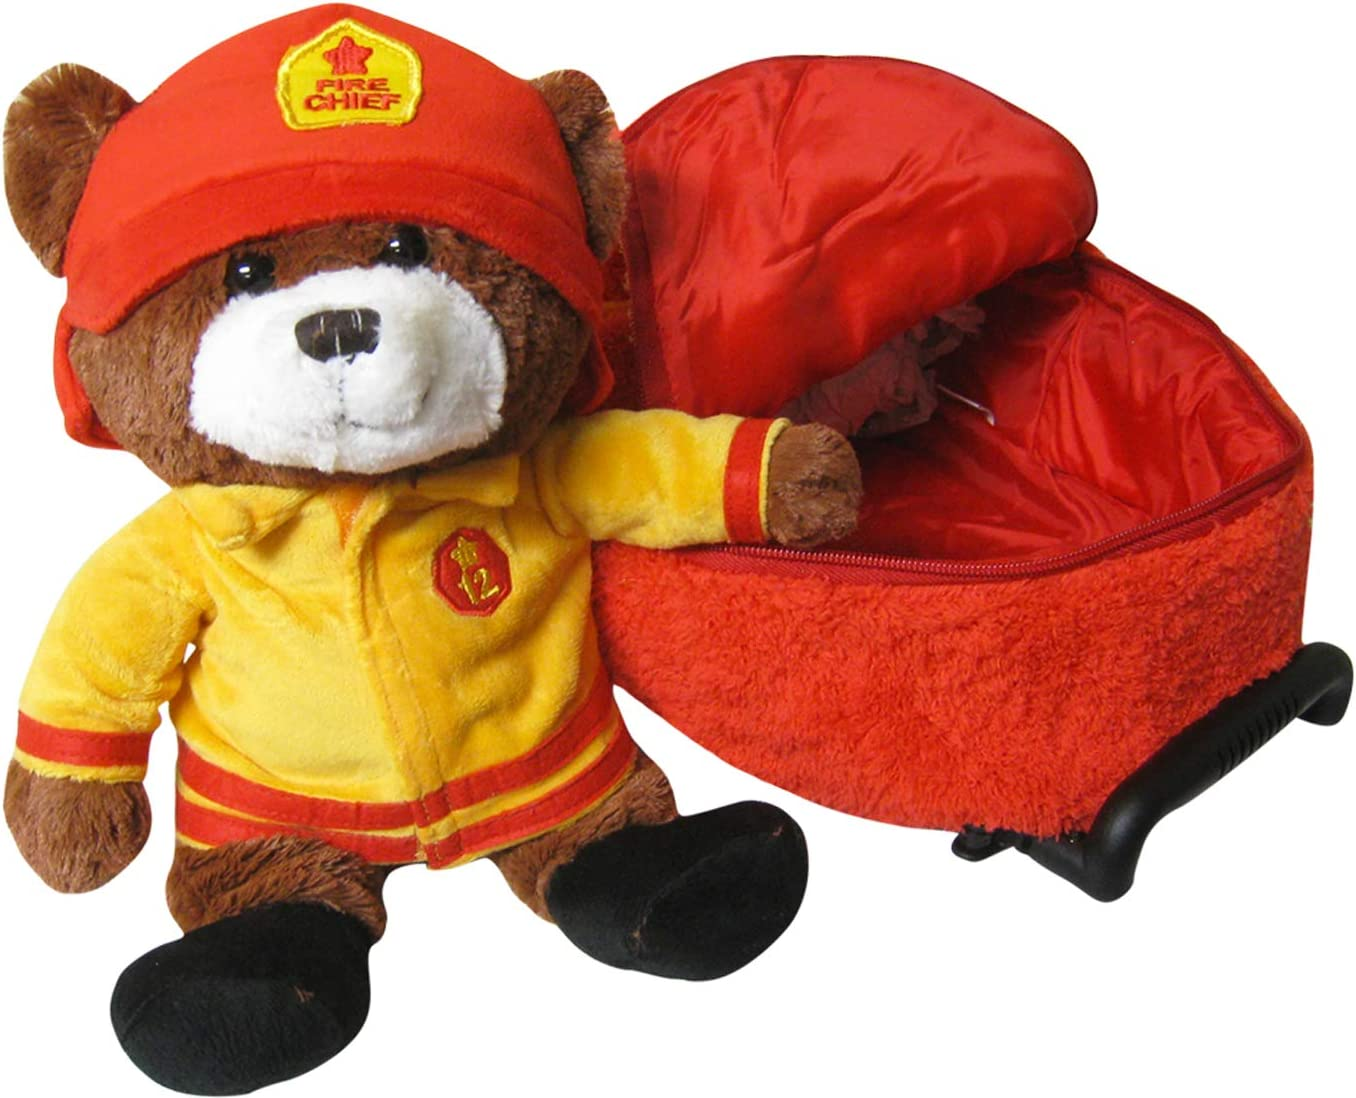 Kreative Kids Kreative Kids Red Fire Chief Bear Plush Backpack 2pc Set Childre